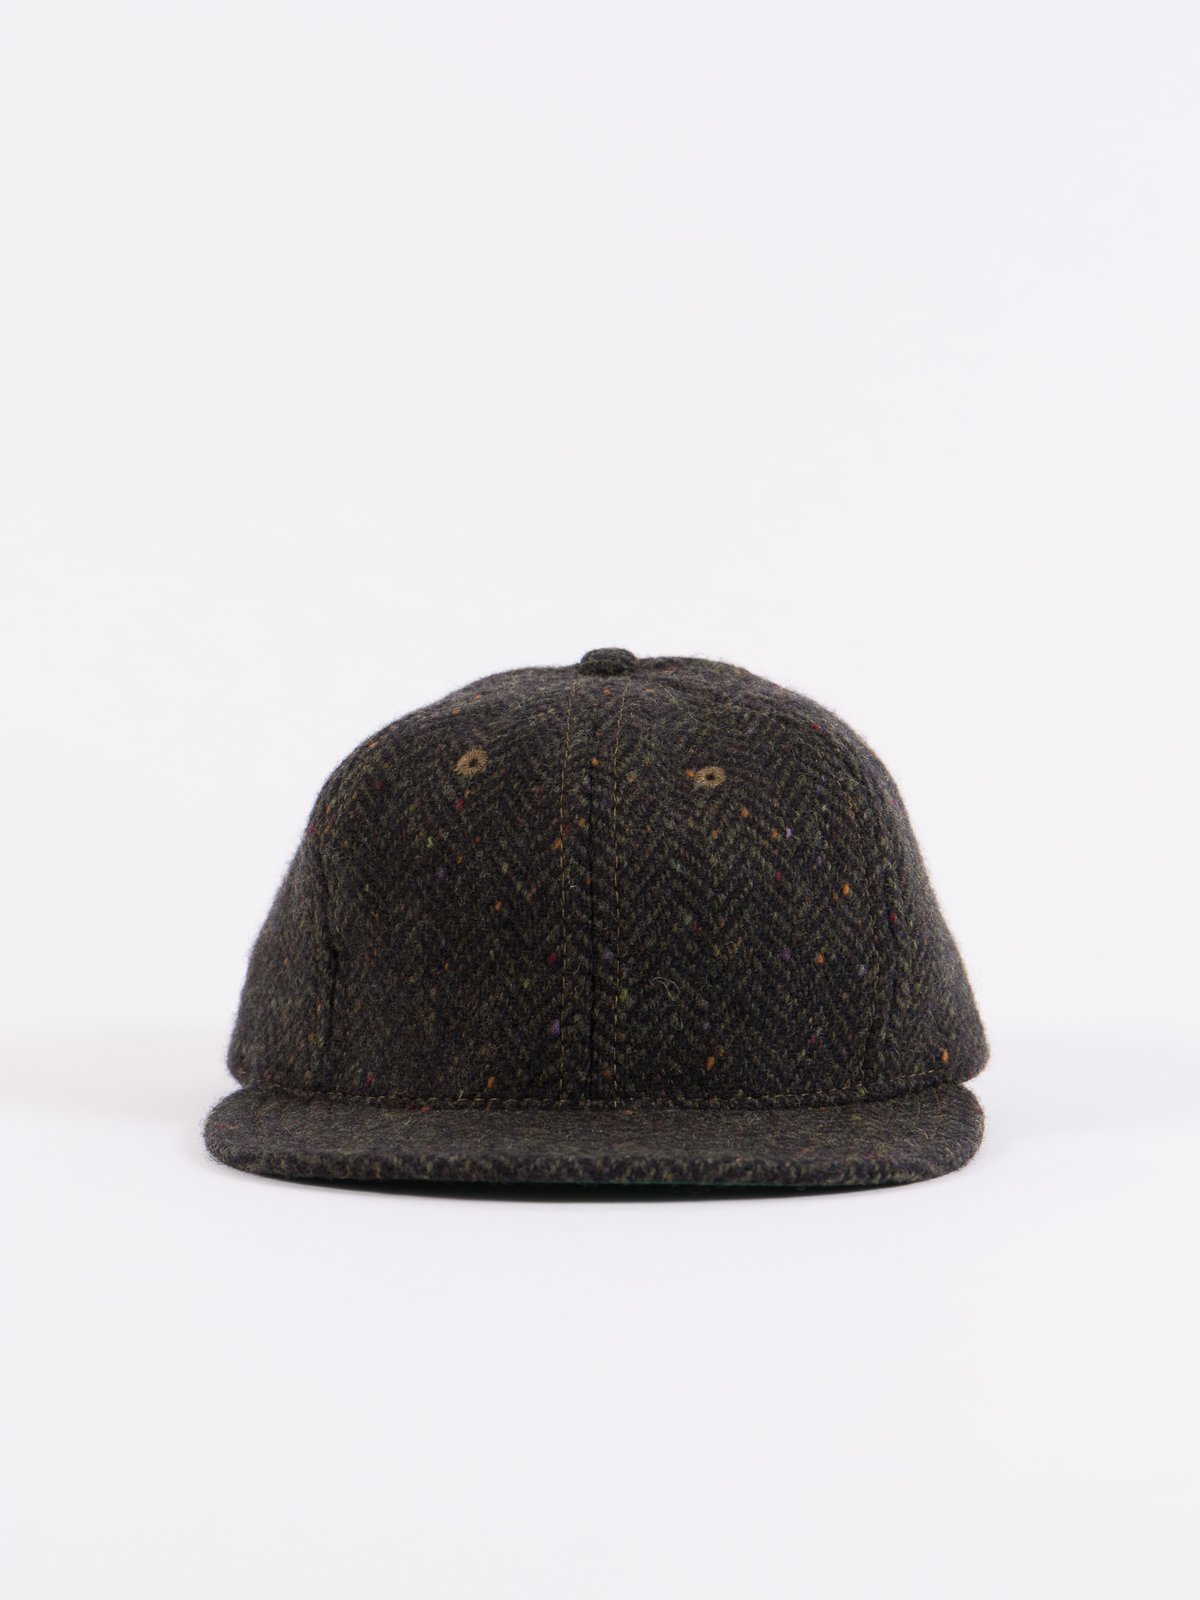 Olive HB Tweed NIer 6 Panel Ballcap - Image 3